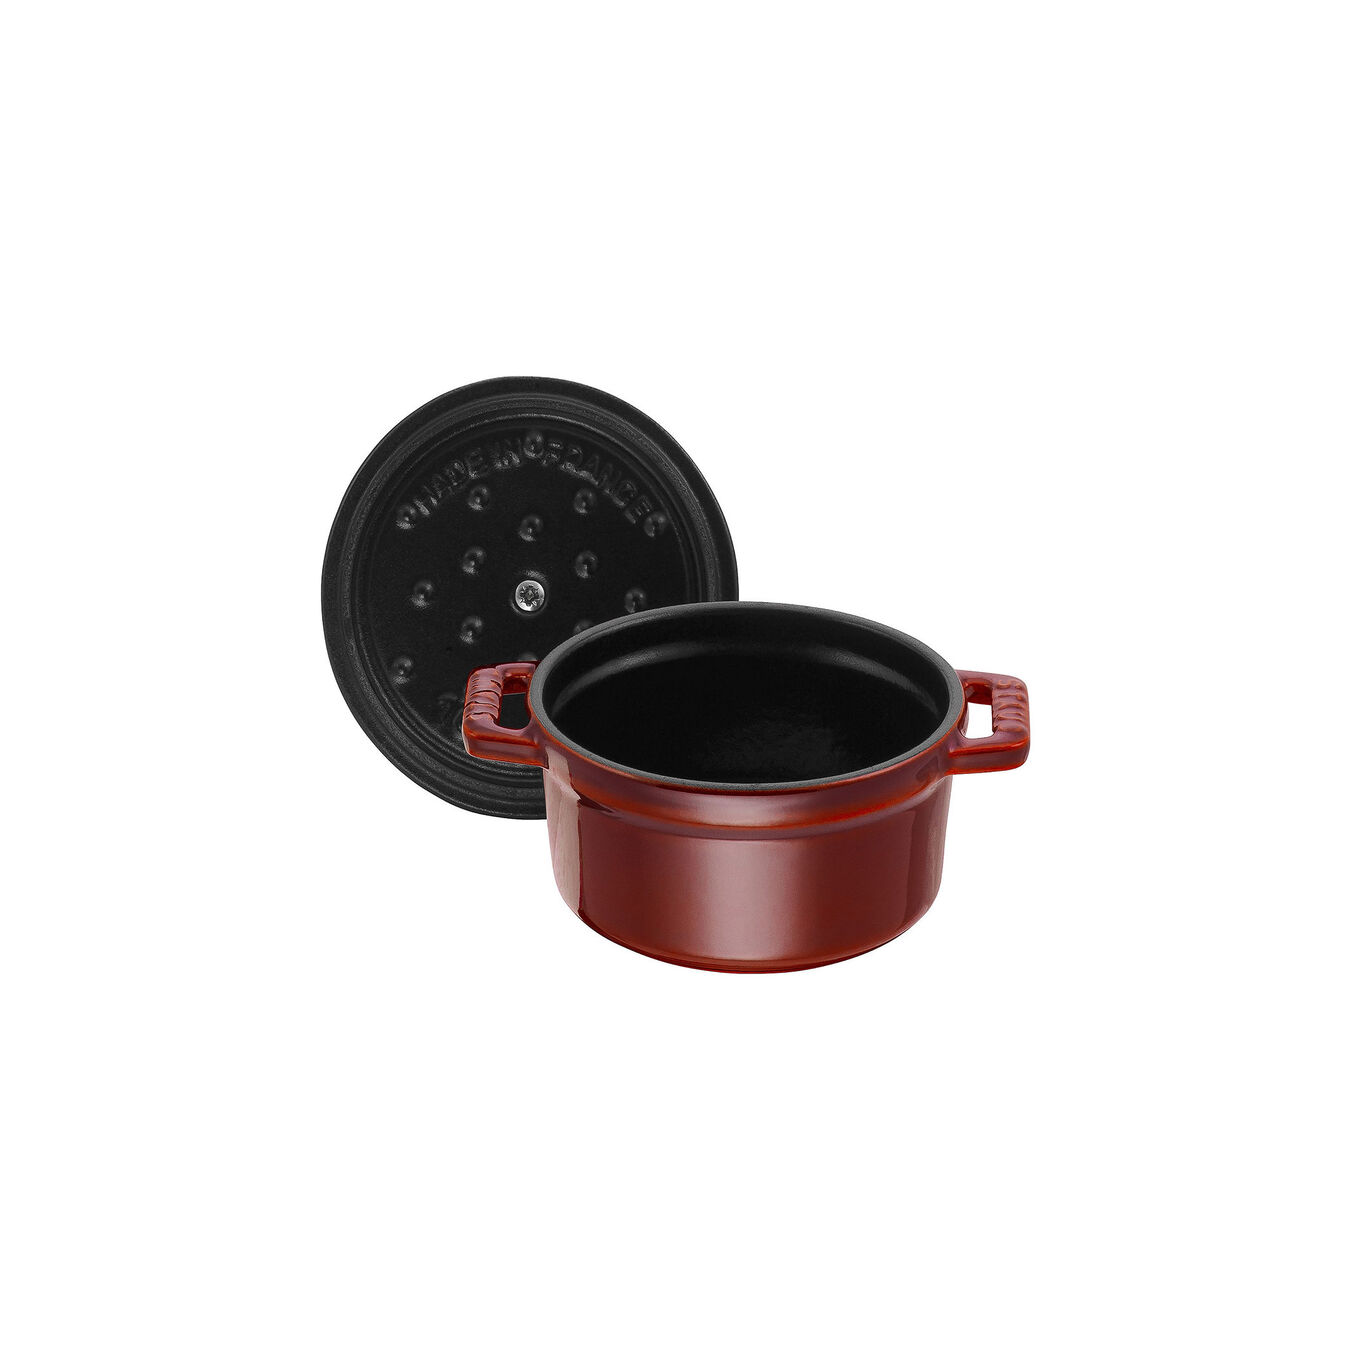 250 ml Cast iron round Mini Cocotte, grenadine-red,,large 5